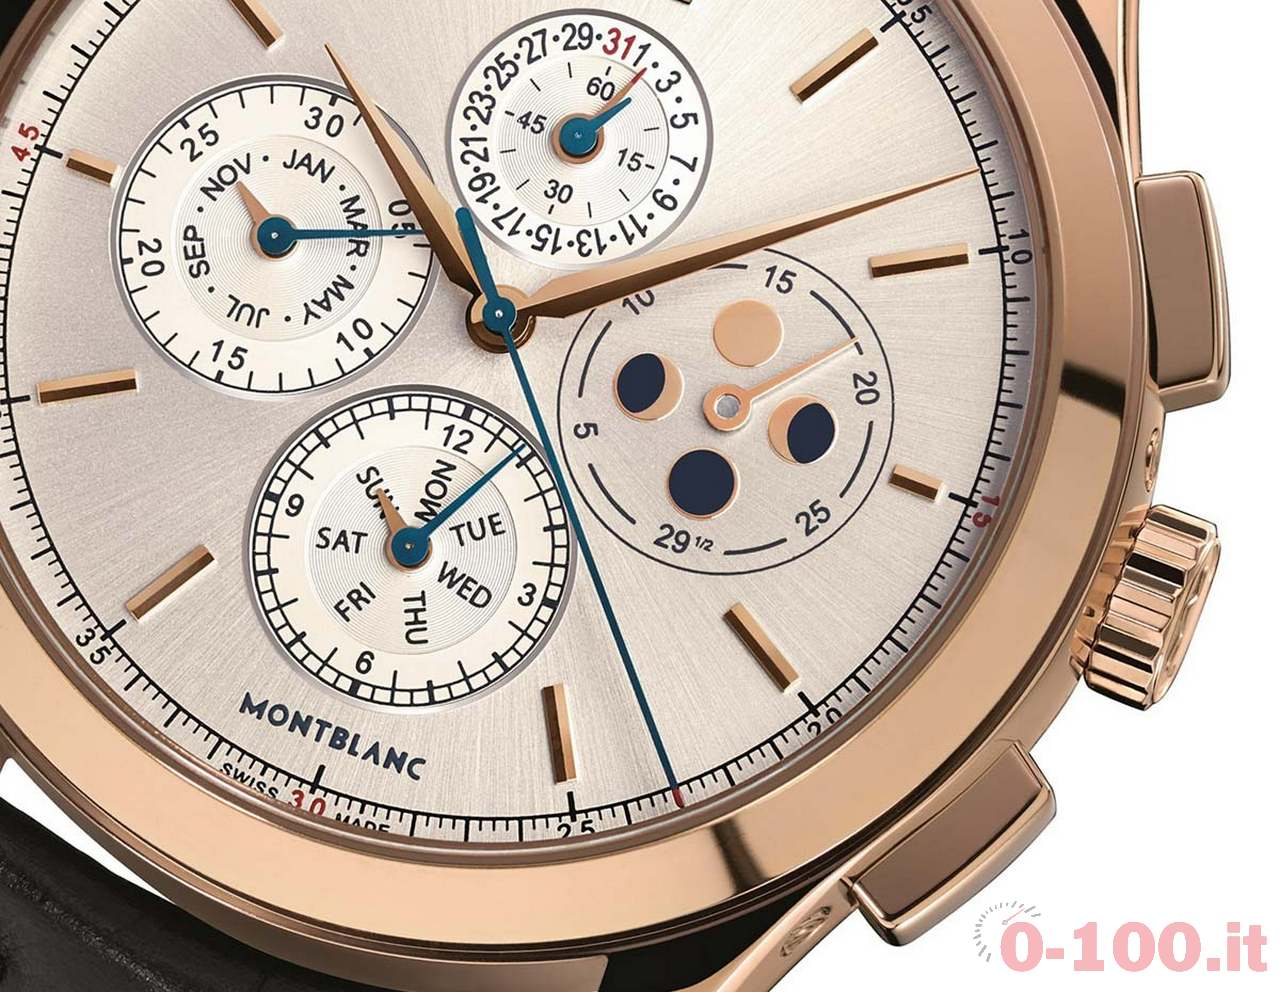 anteprima-sihh-2016-montblanc-heritage-chronometrie-chronograph-quantieme-annuel-ref-114876-prezzo-price_0-1003